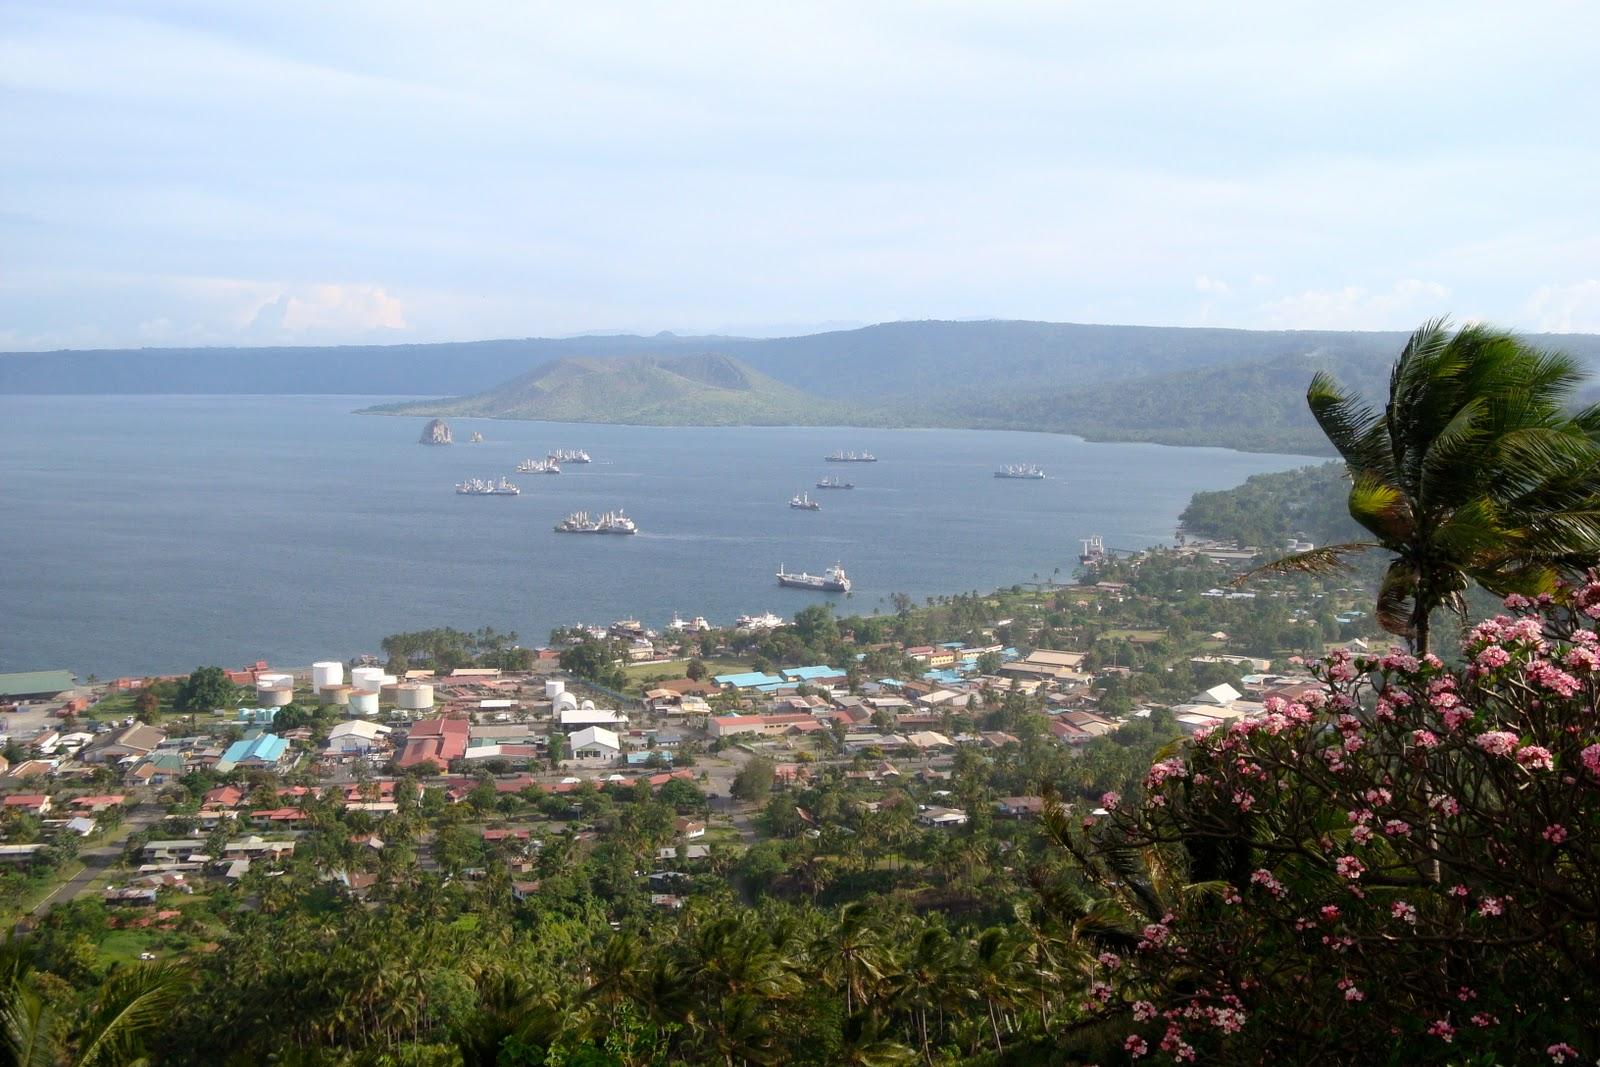 Rabaul (New Britain Island, Papua New Guinea) cruise port